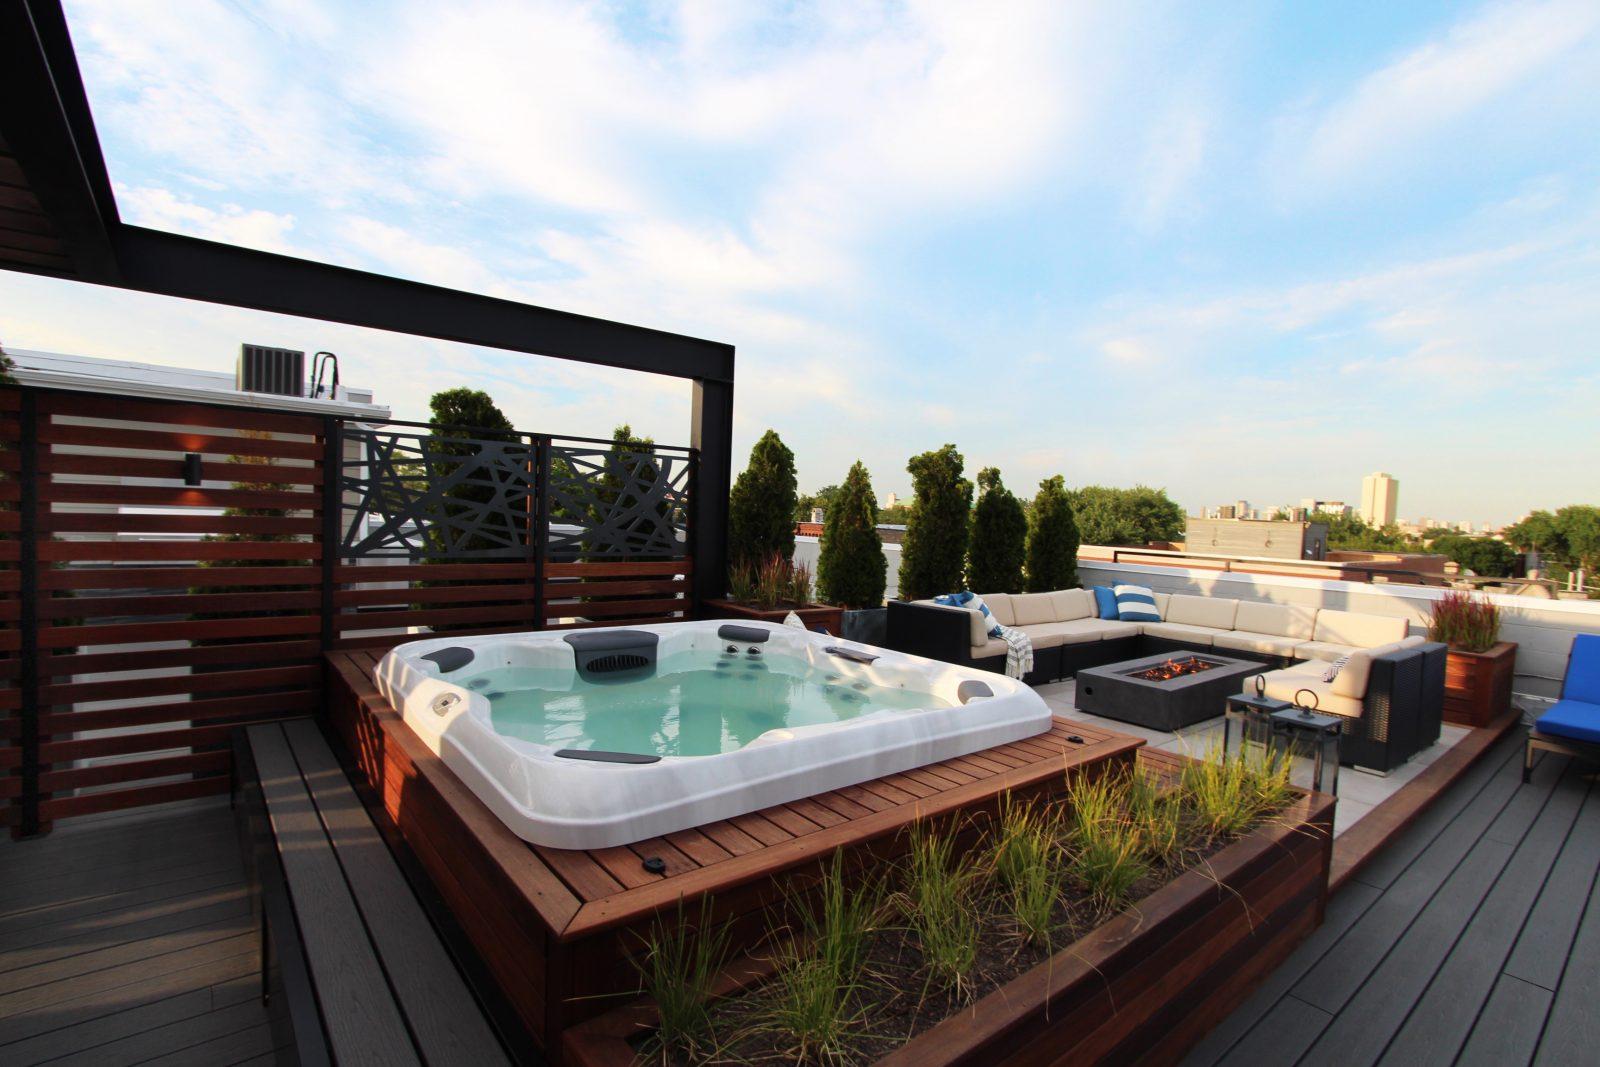 Ukrainian Village House Roof Deck Hot Tub in Chicago